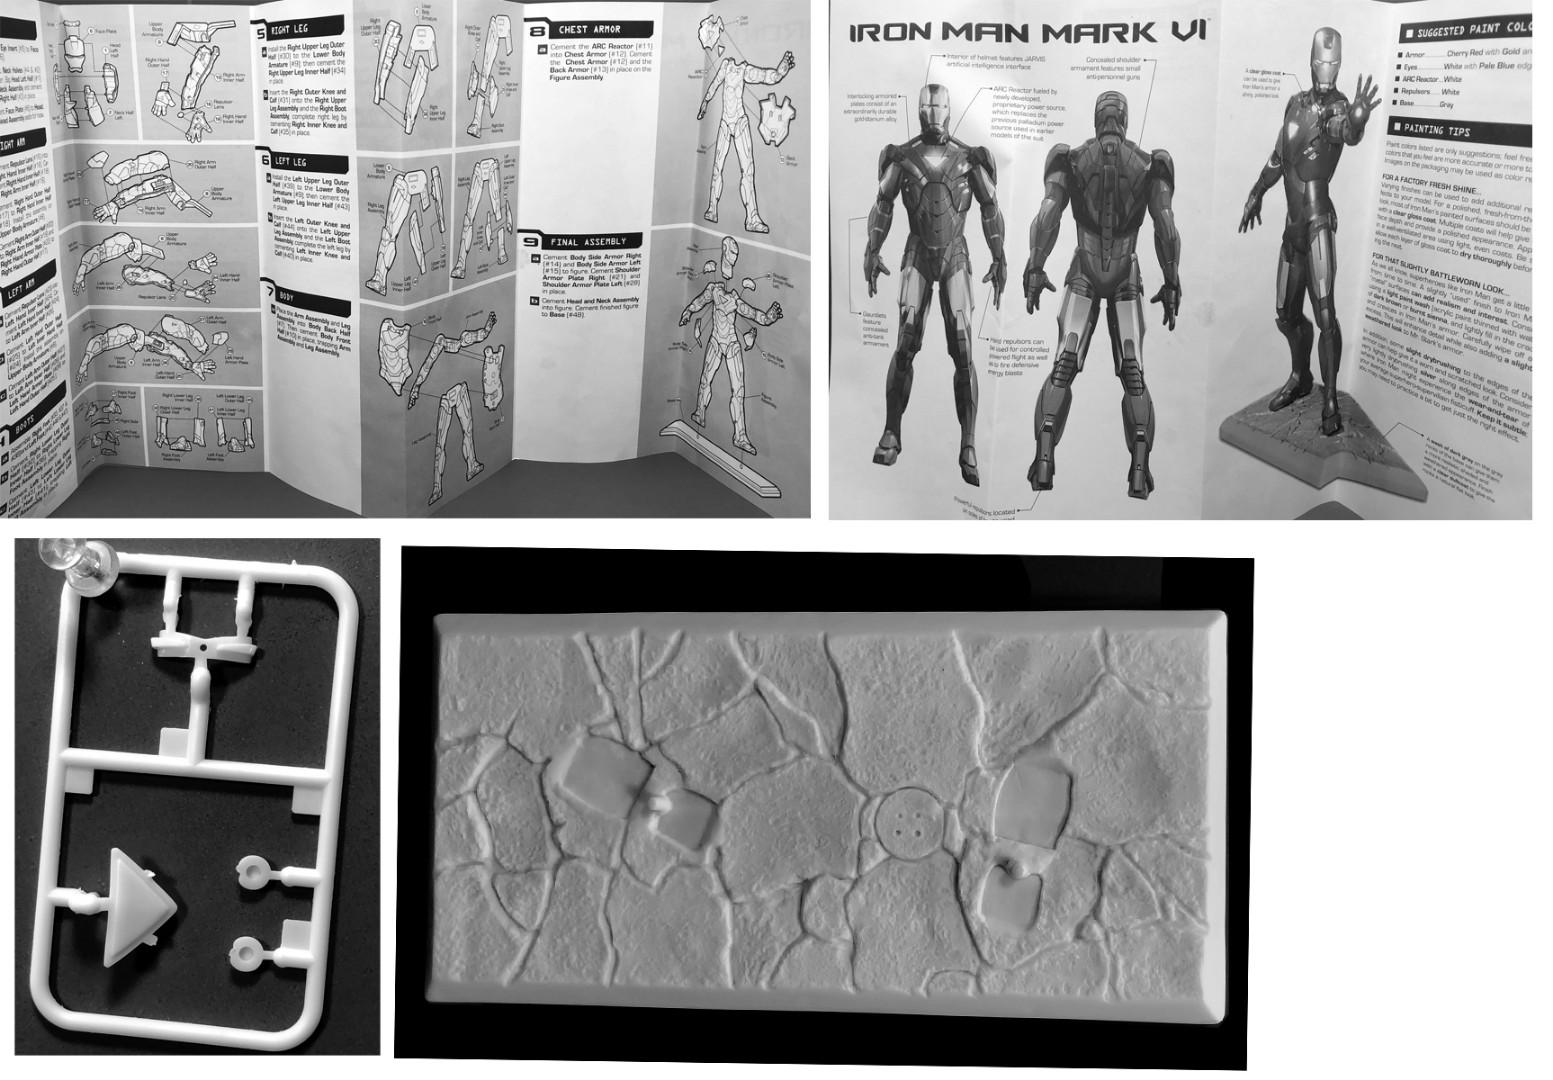 Iron man Mk 6 08 15 2019.jpg